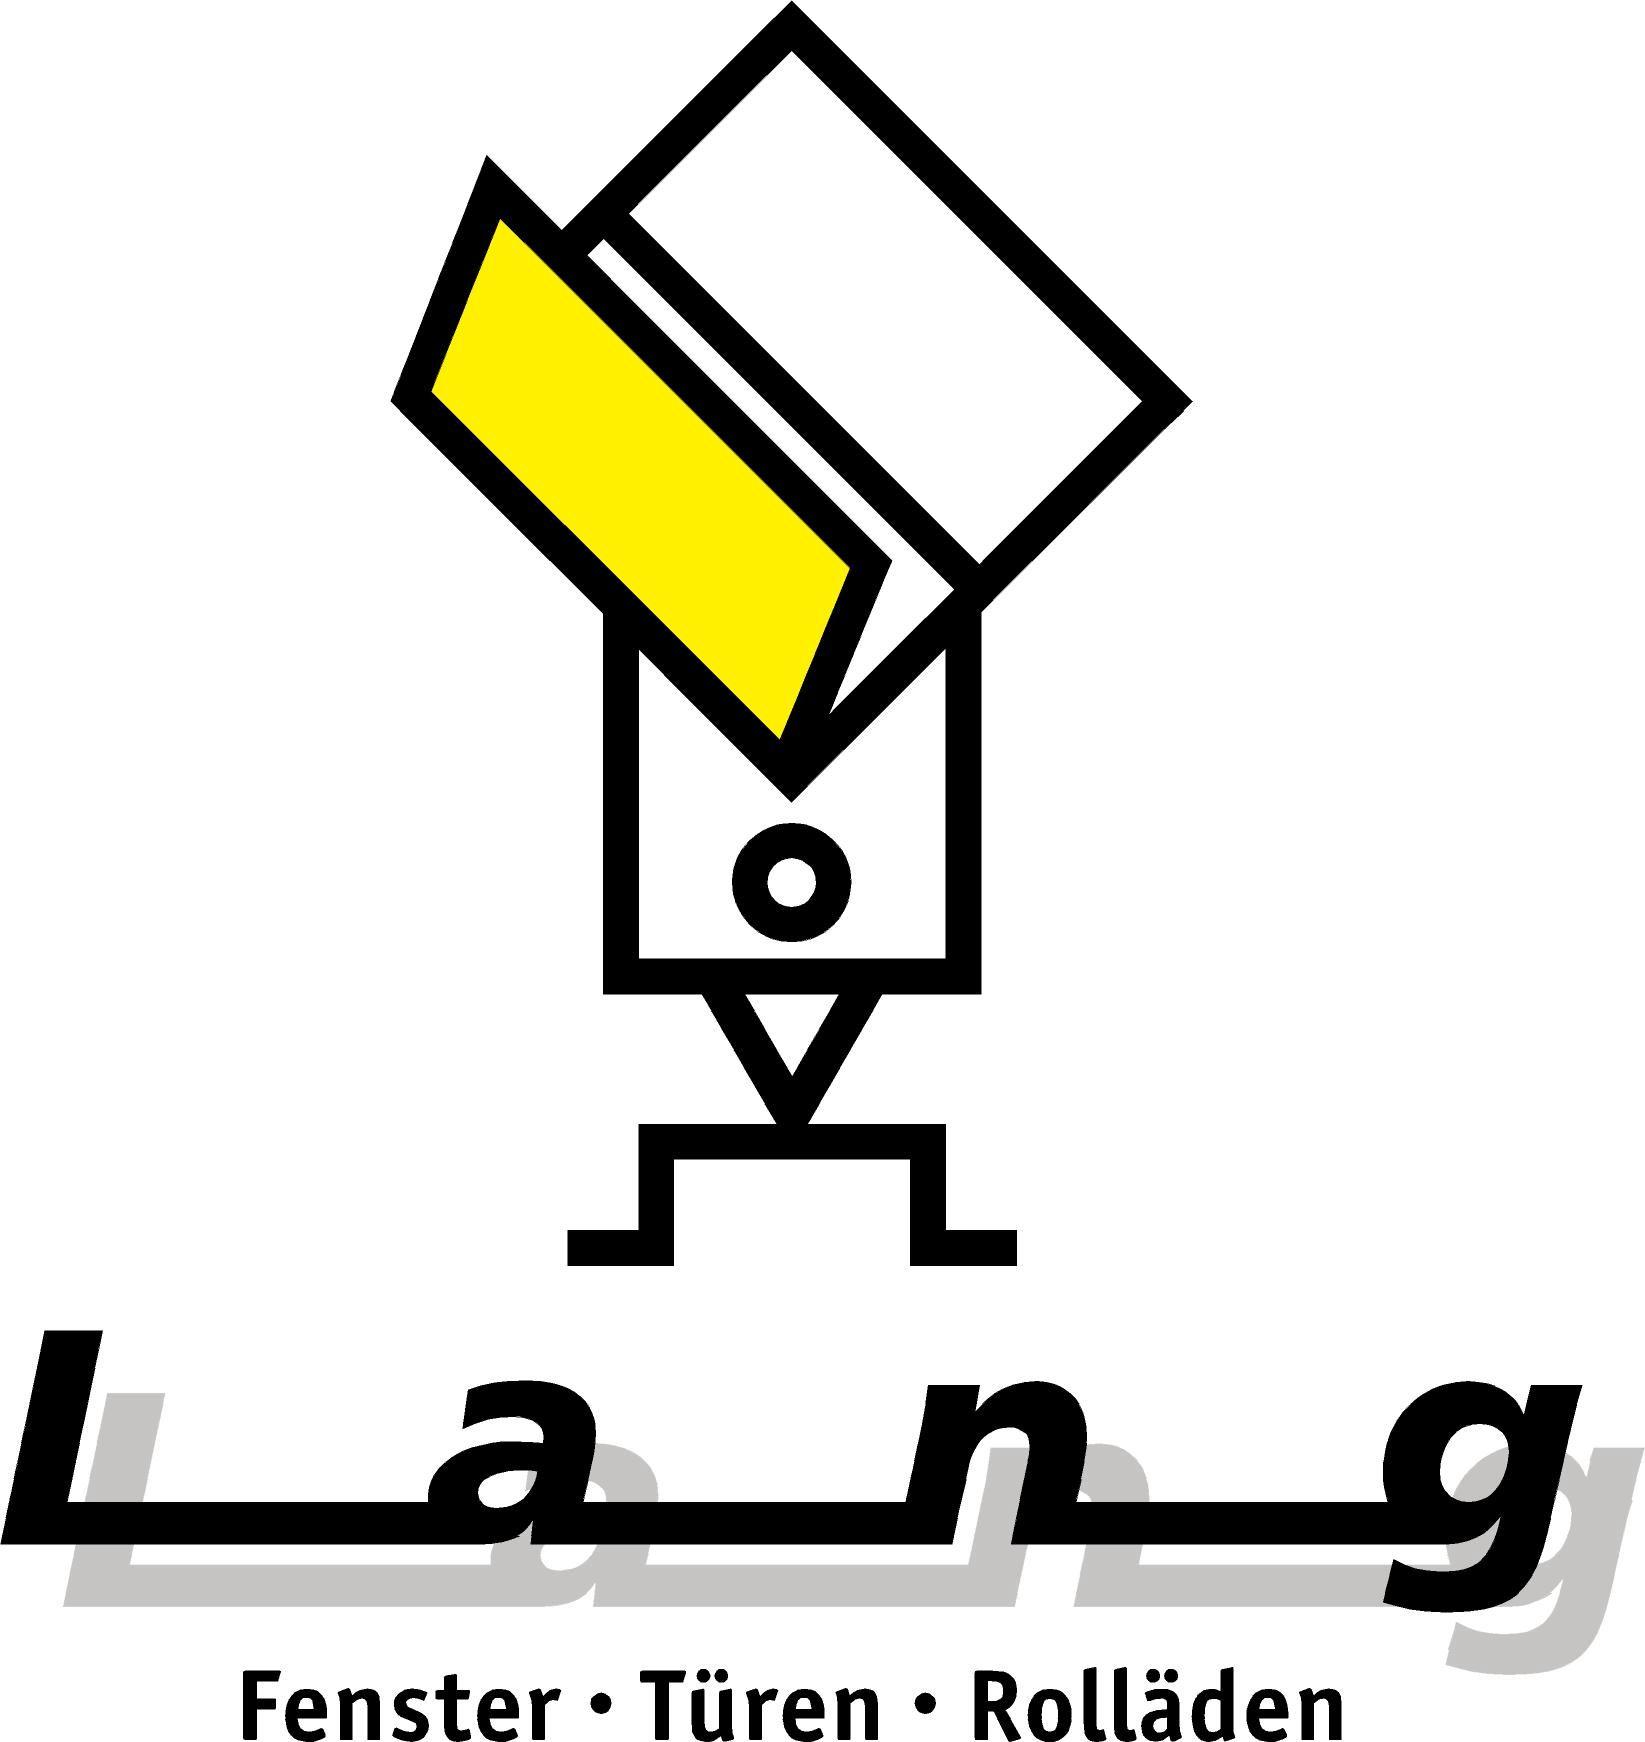 Fensterbau Lang logo